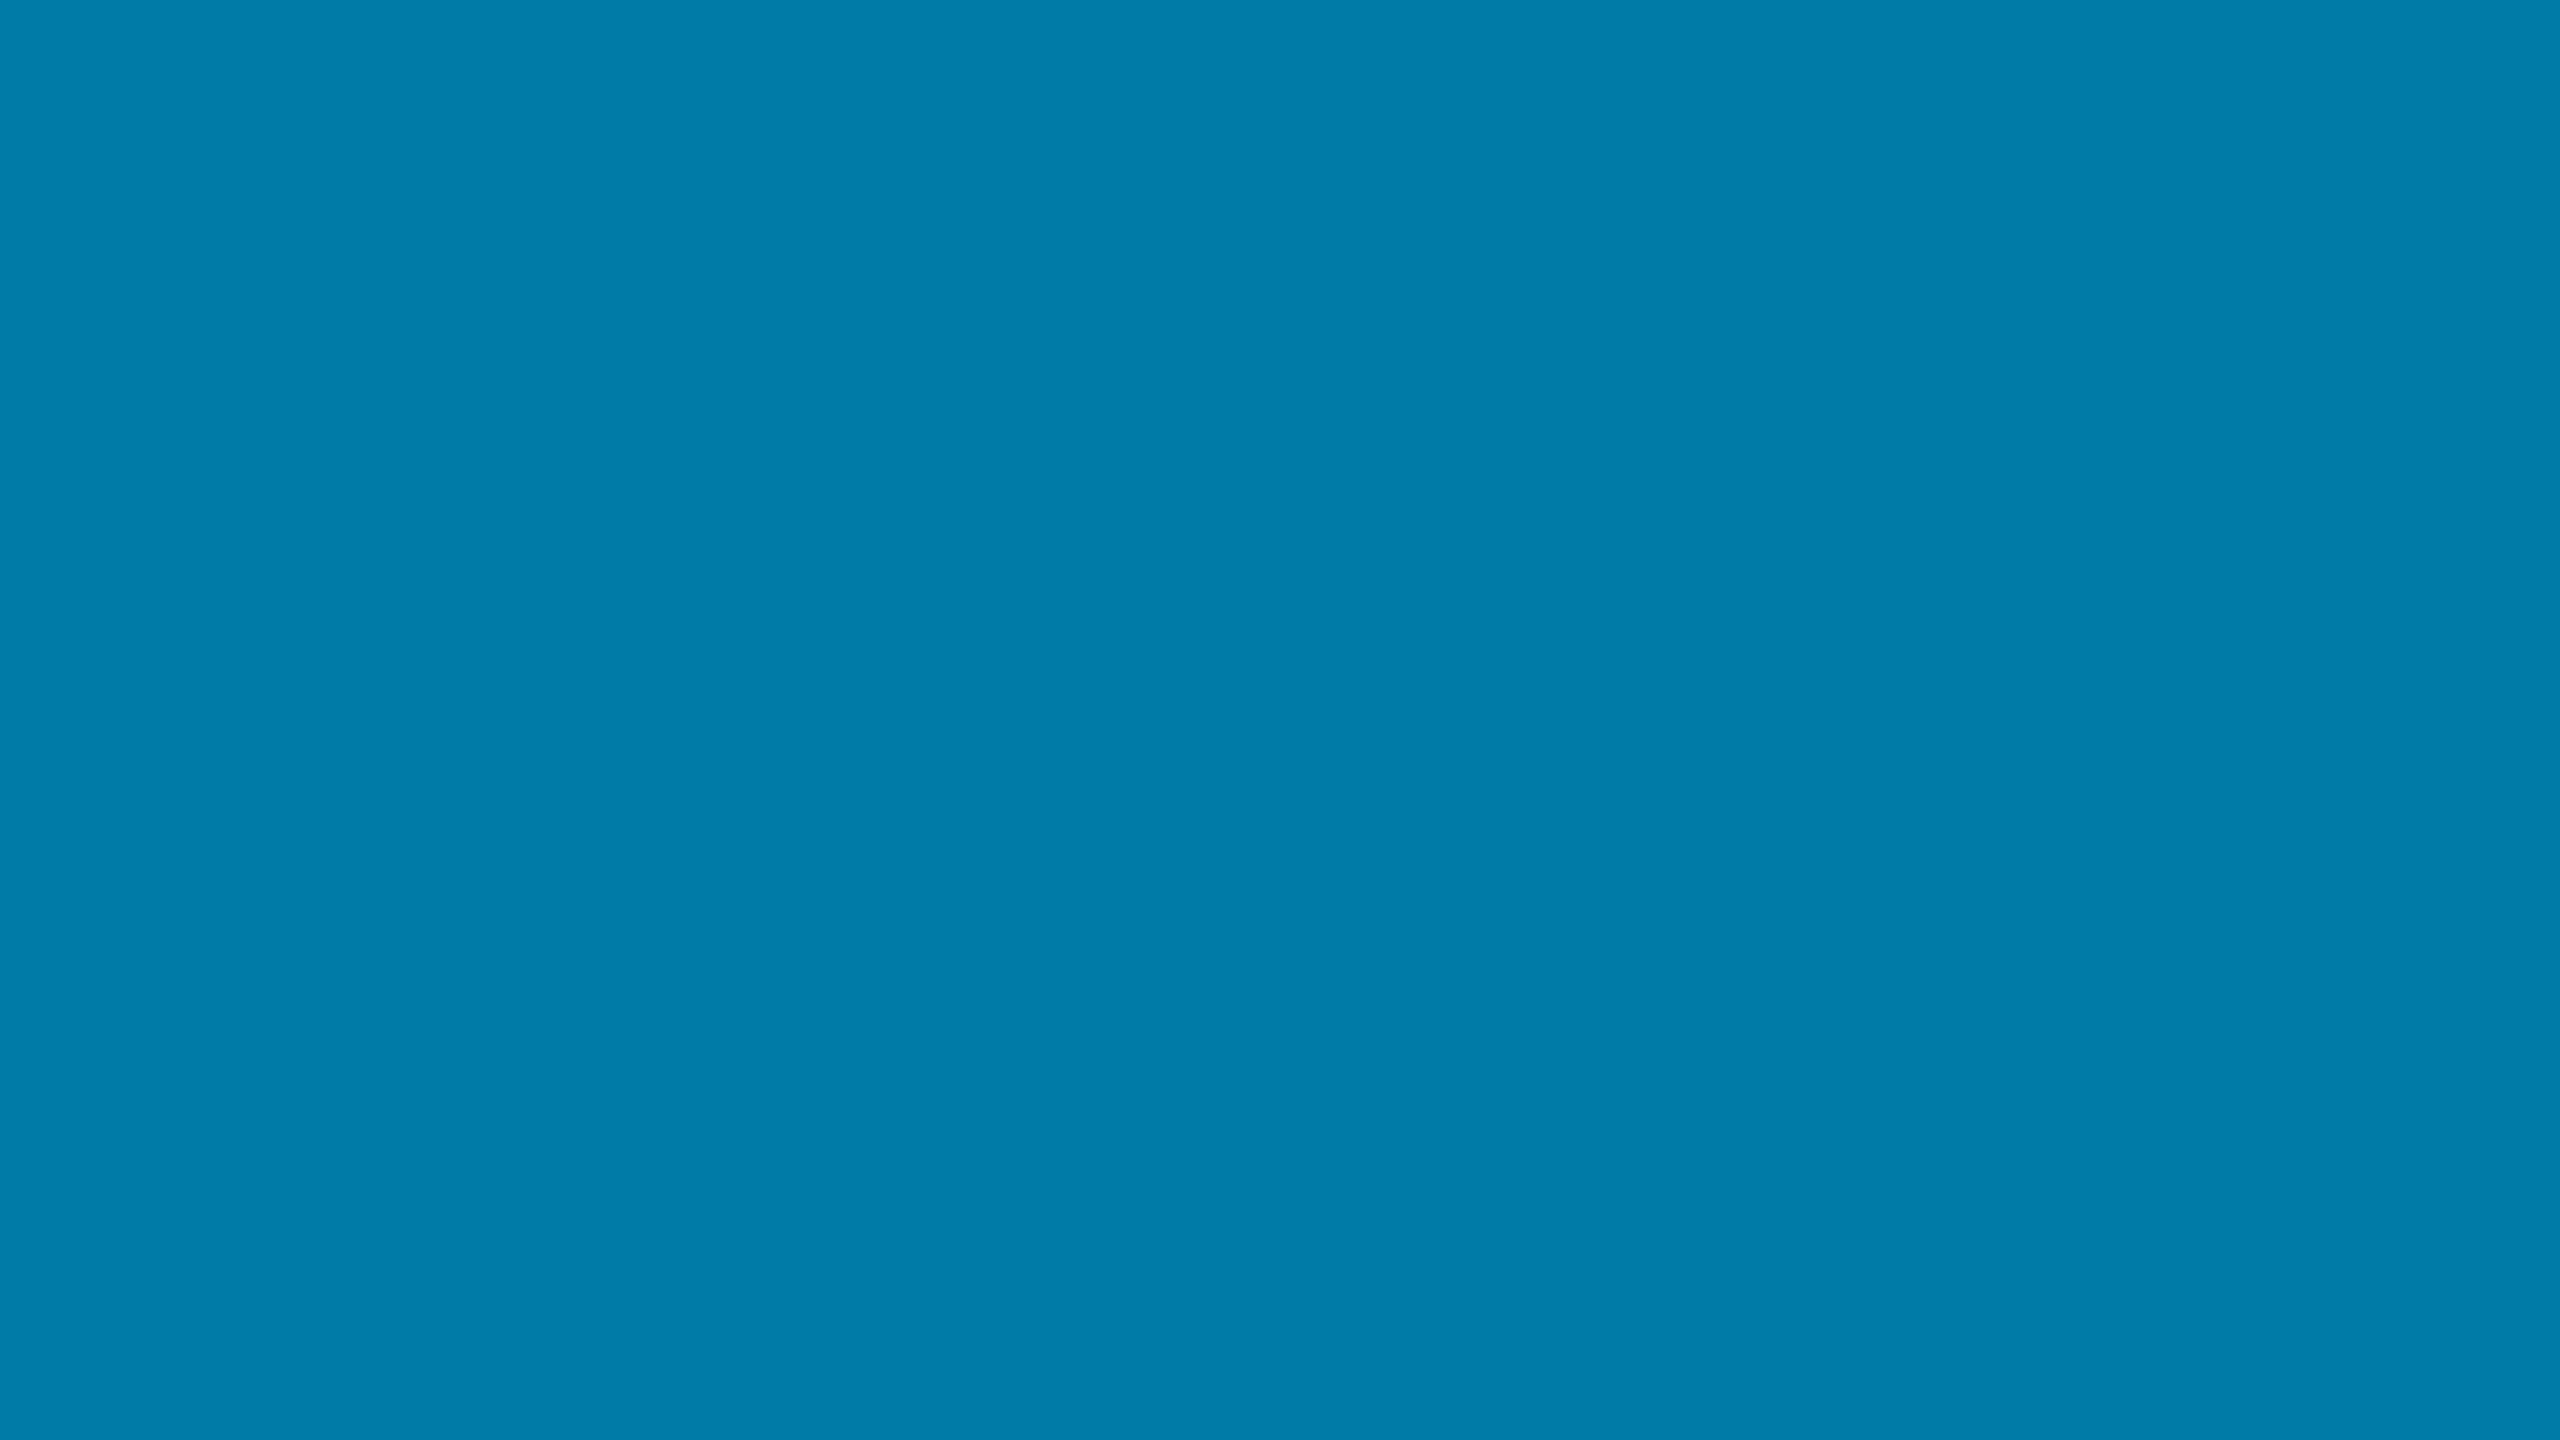 2560x1440 Celadon Blue Solid Color Background